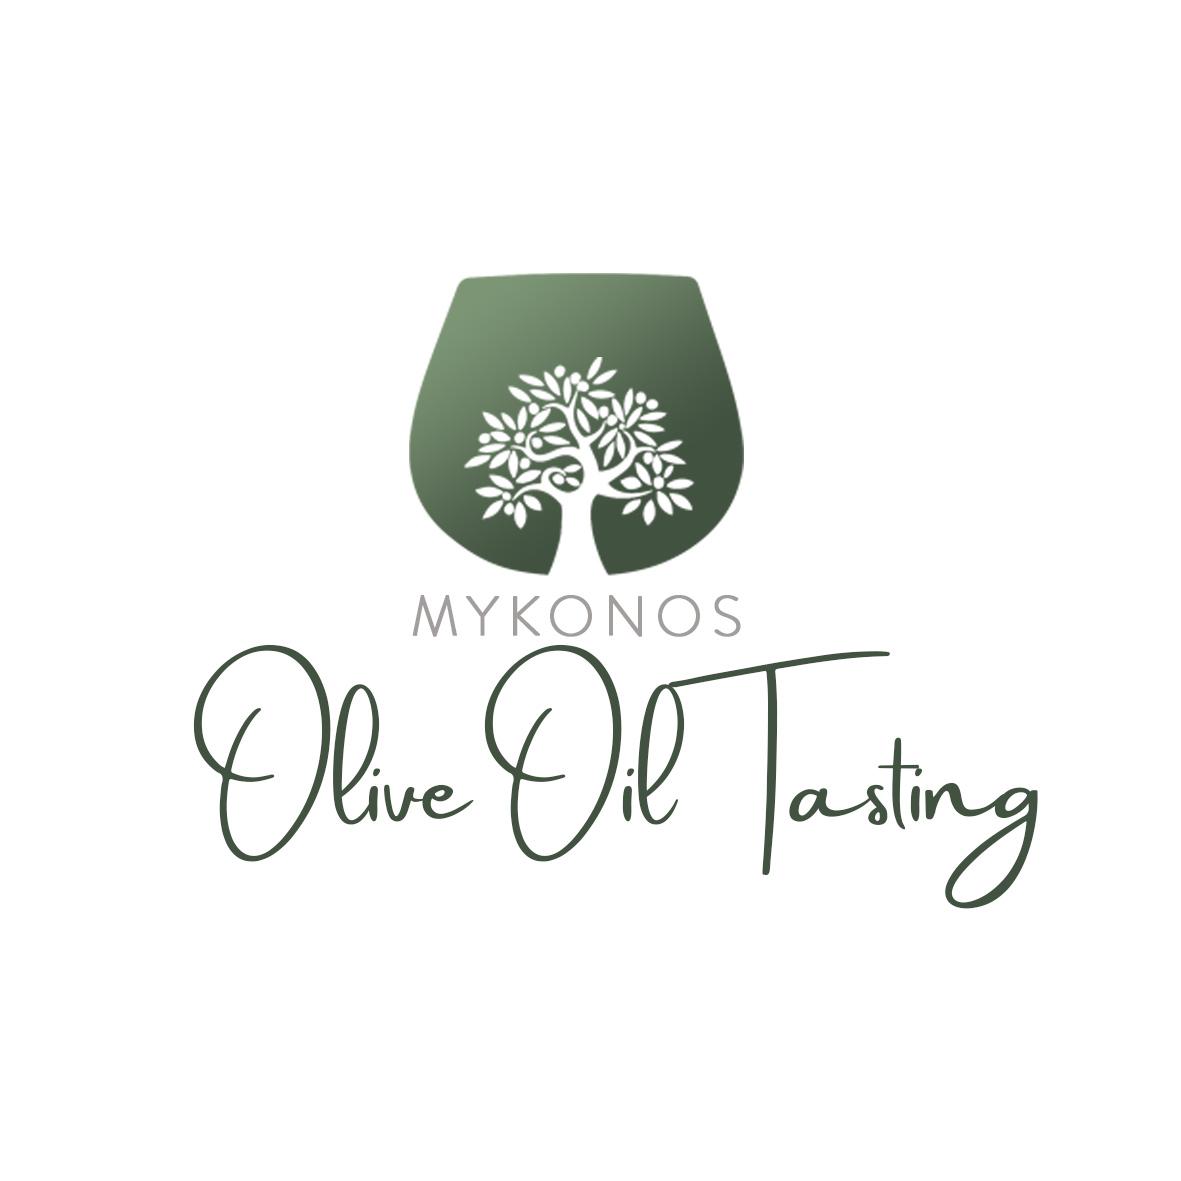 Mykonos Olive Oil Tasting